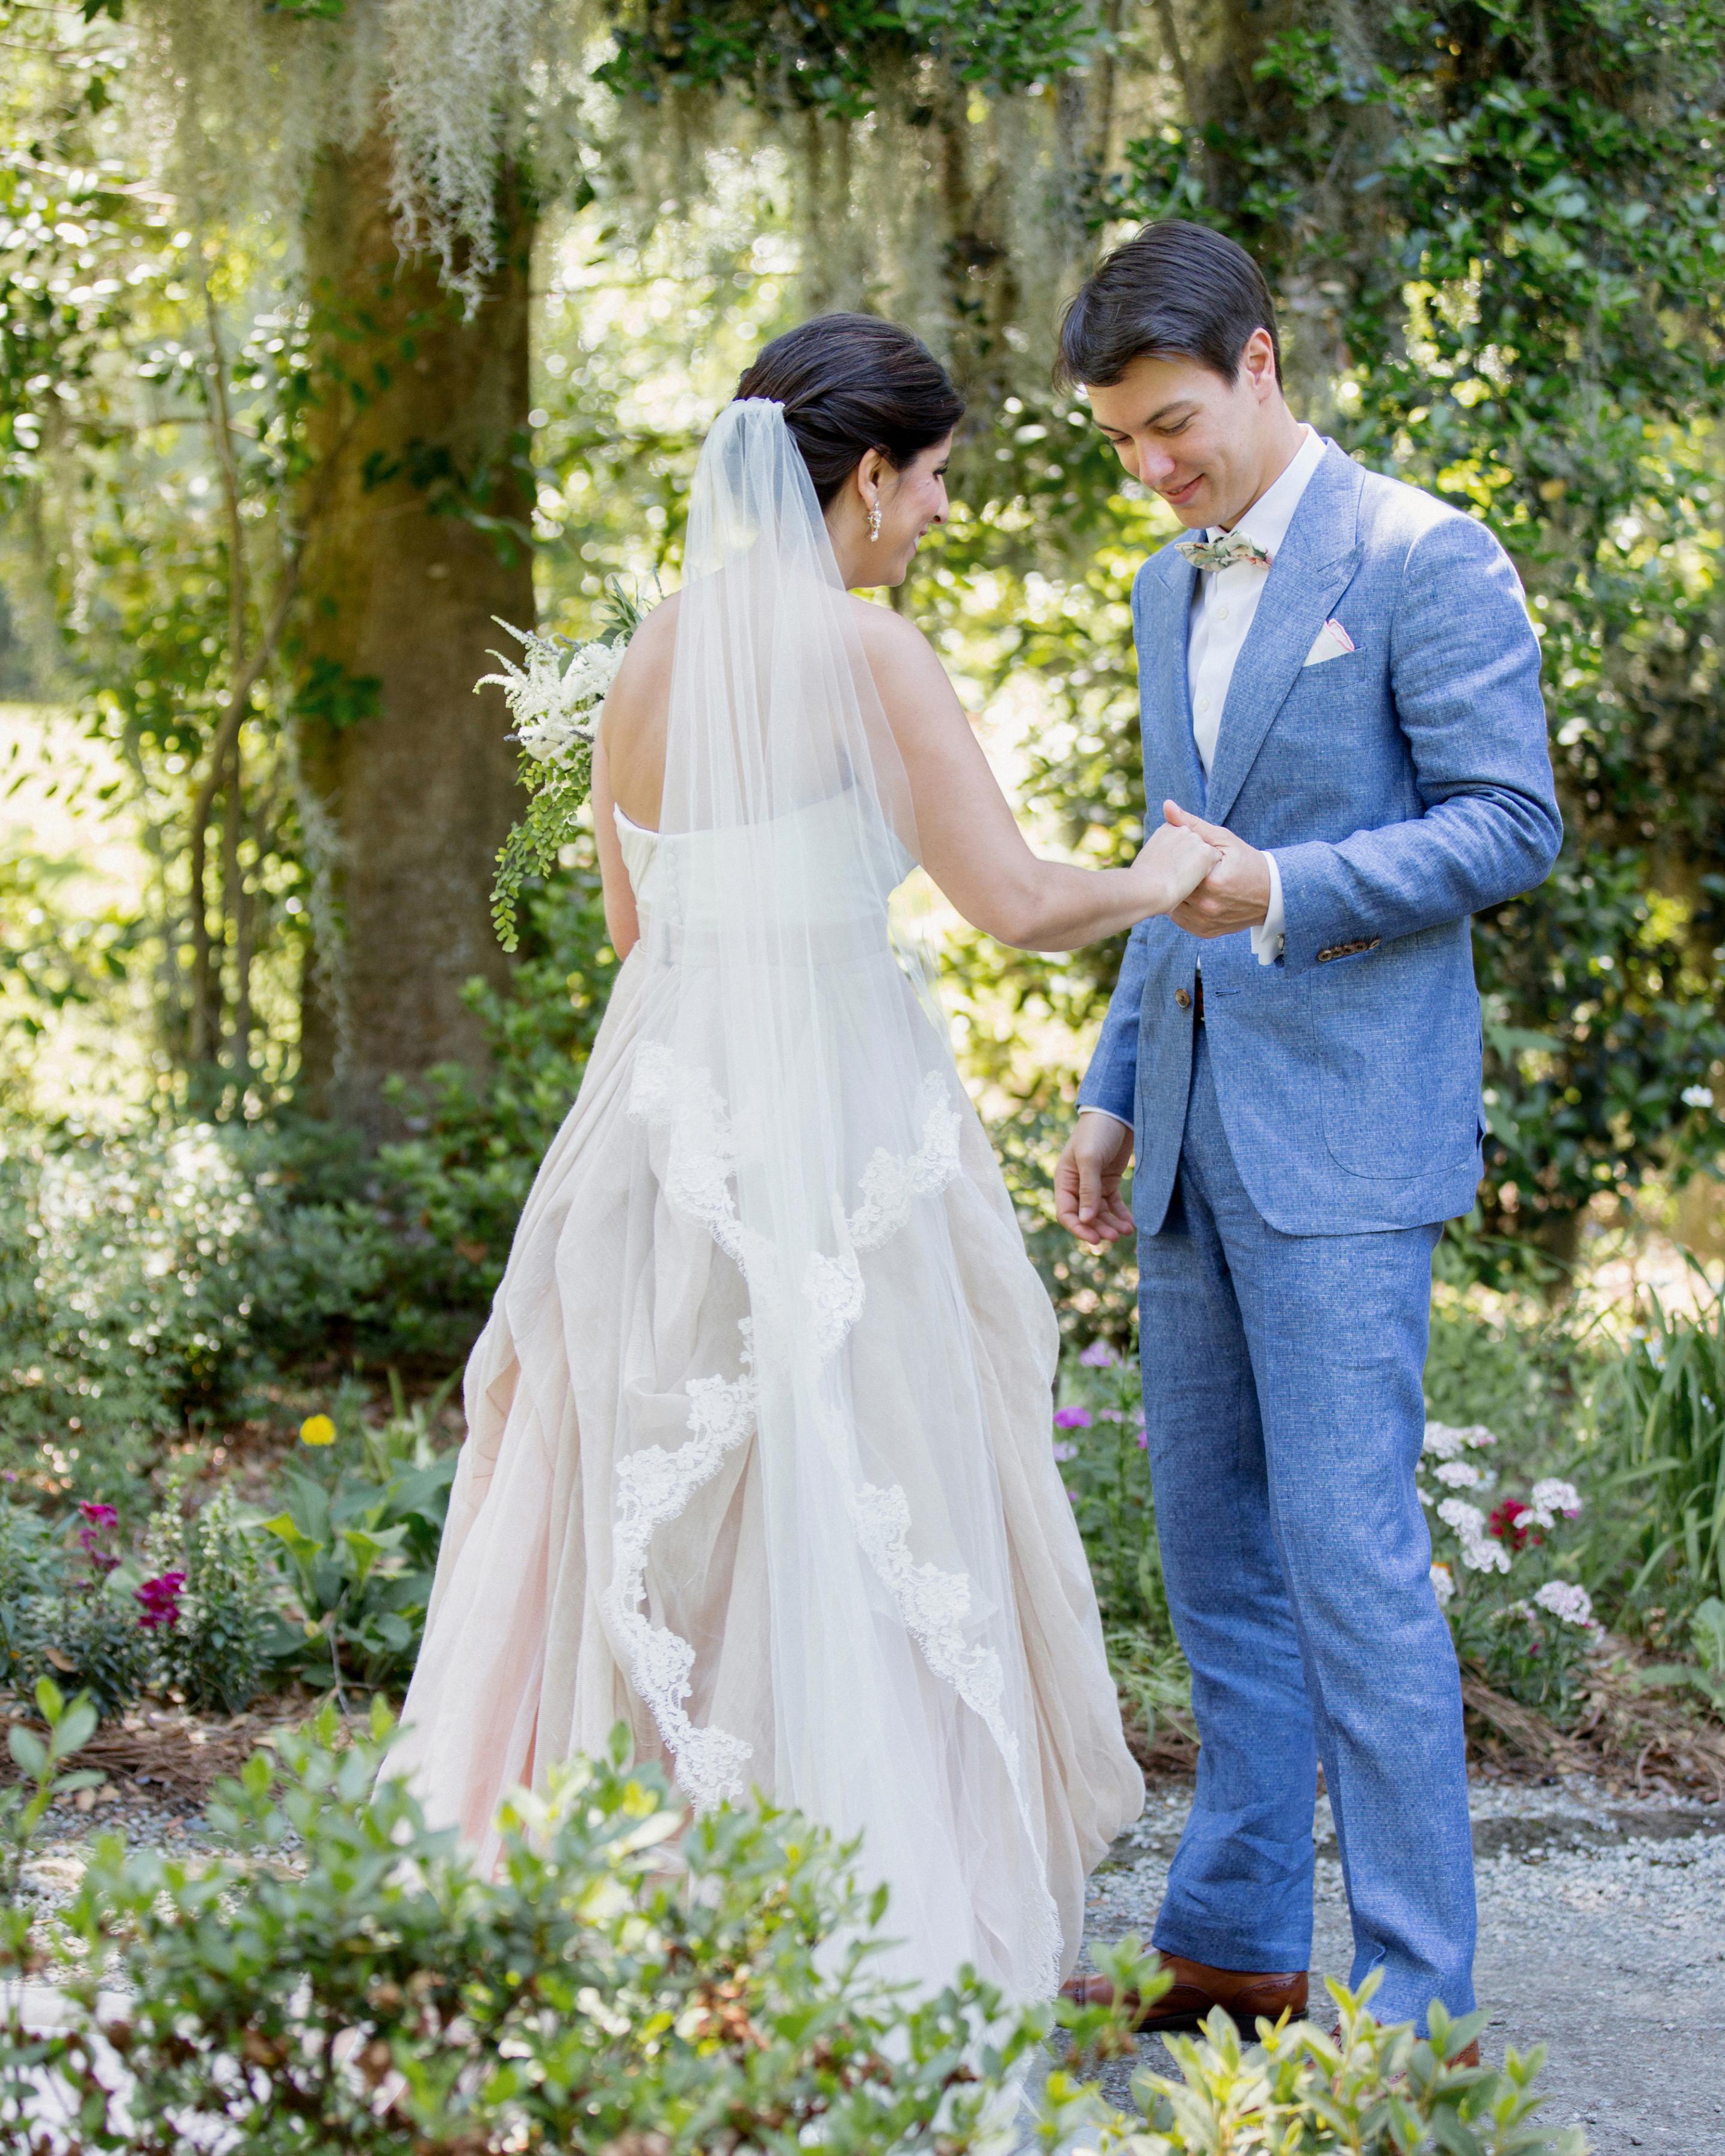 catherine-adrien-wedding-firstlook-0370-s111414-0814.jpg